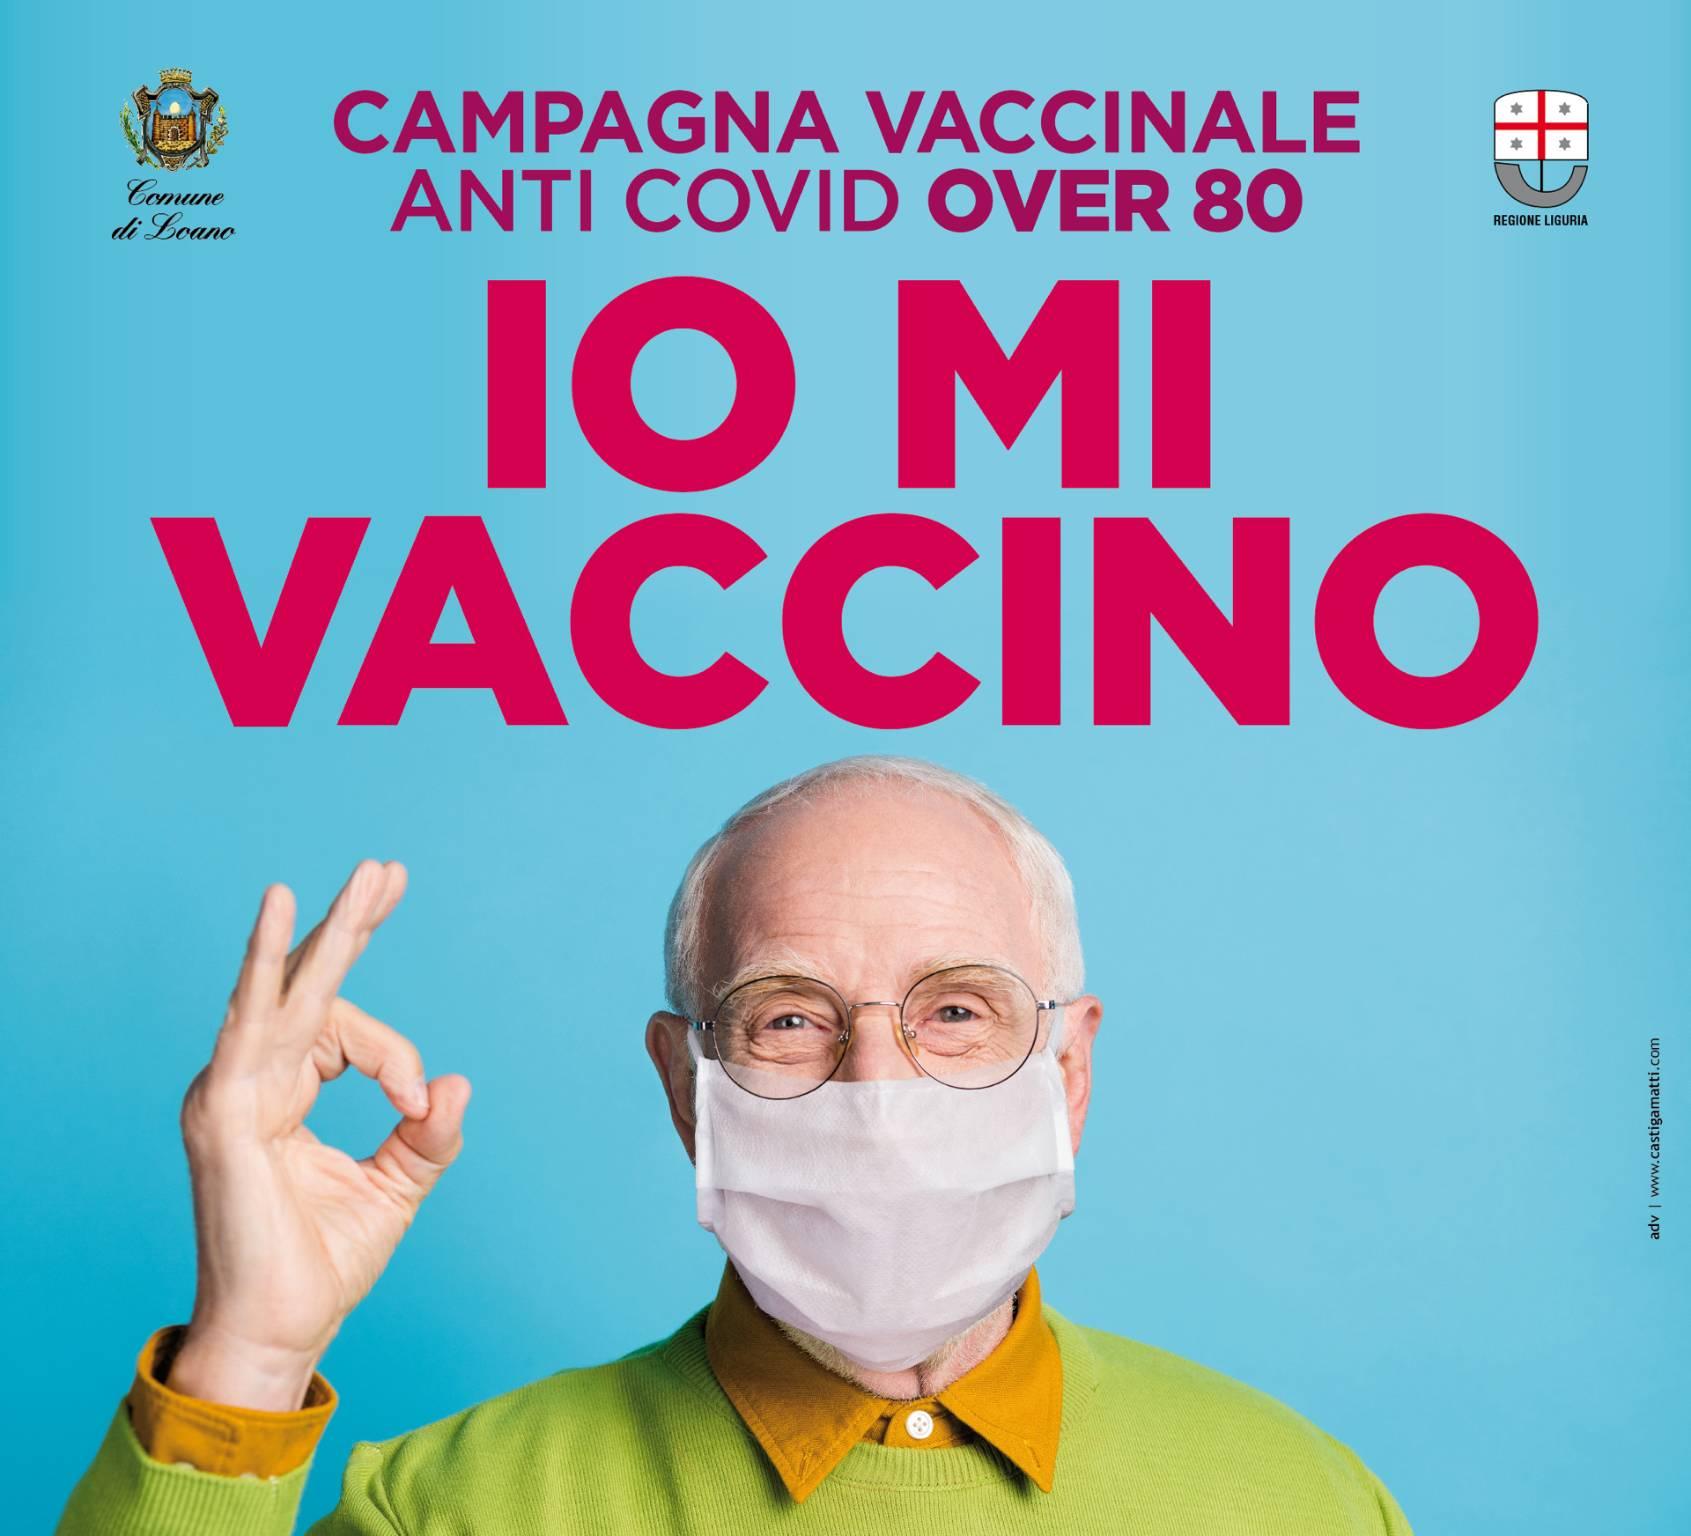 Loano campagna Vaccinale